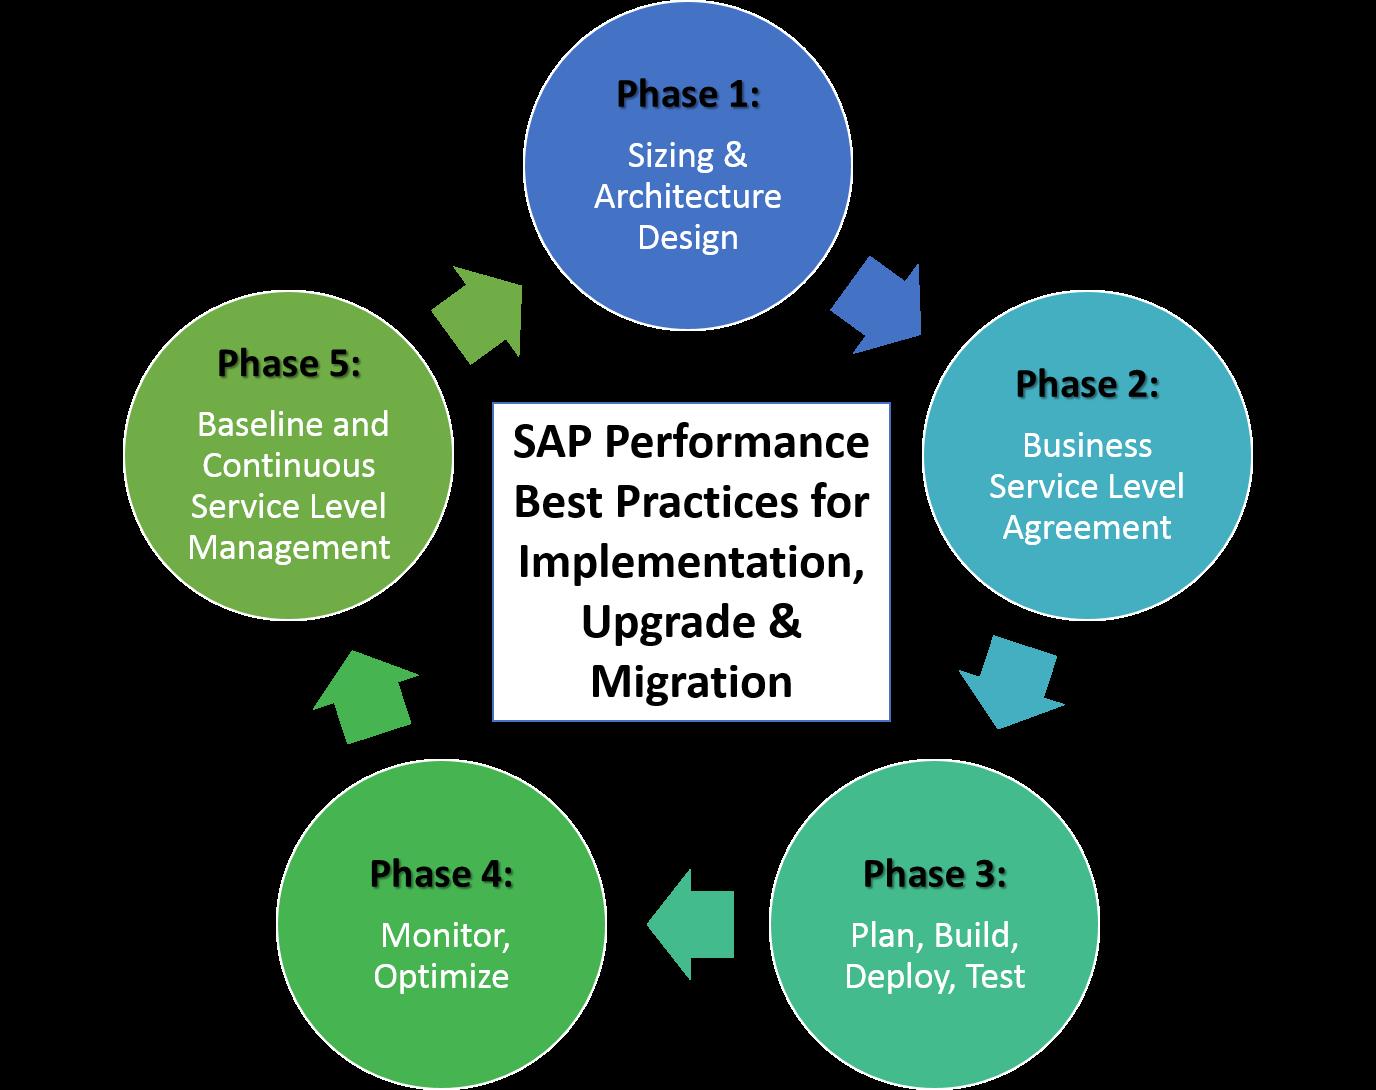 Sap Performance Best Practices For Implementation Upgrade Migration